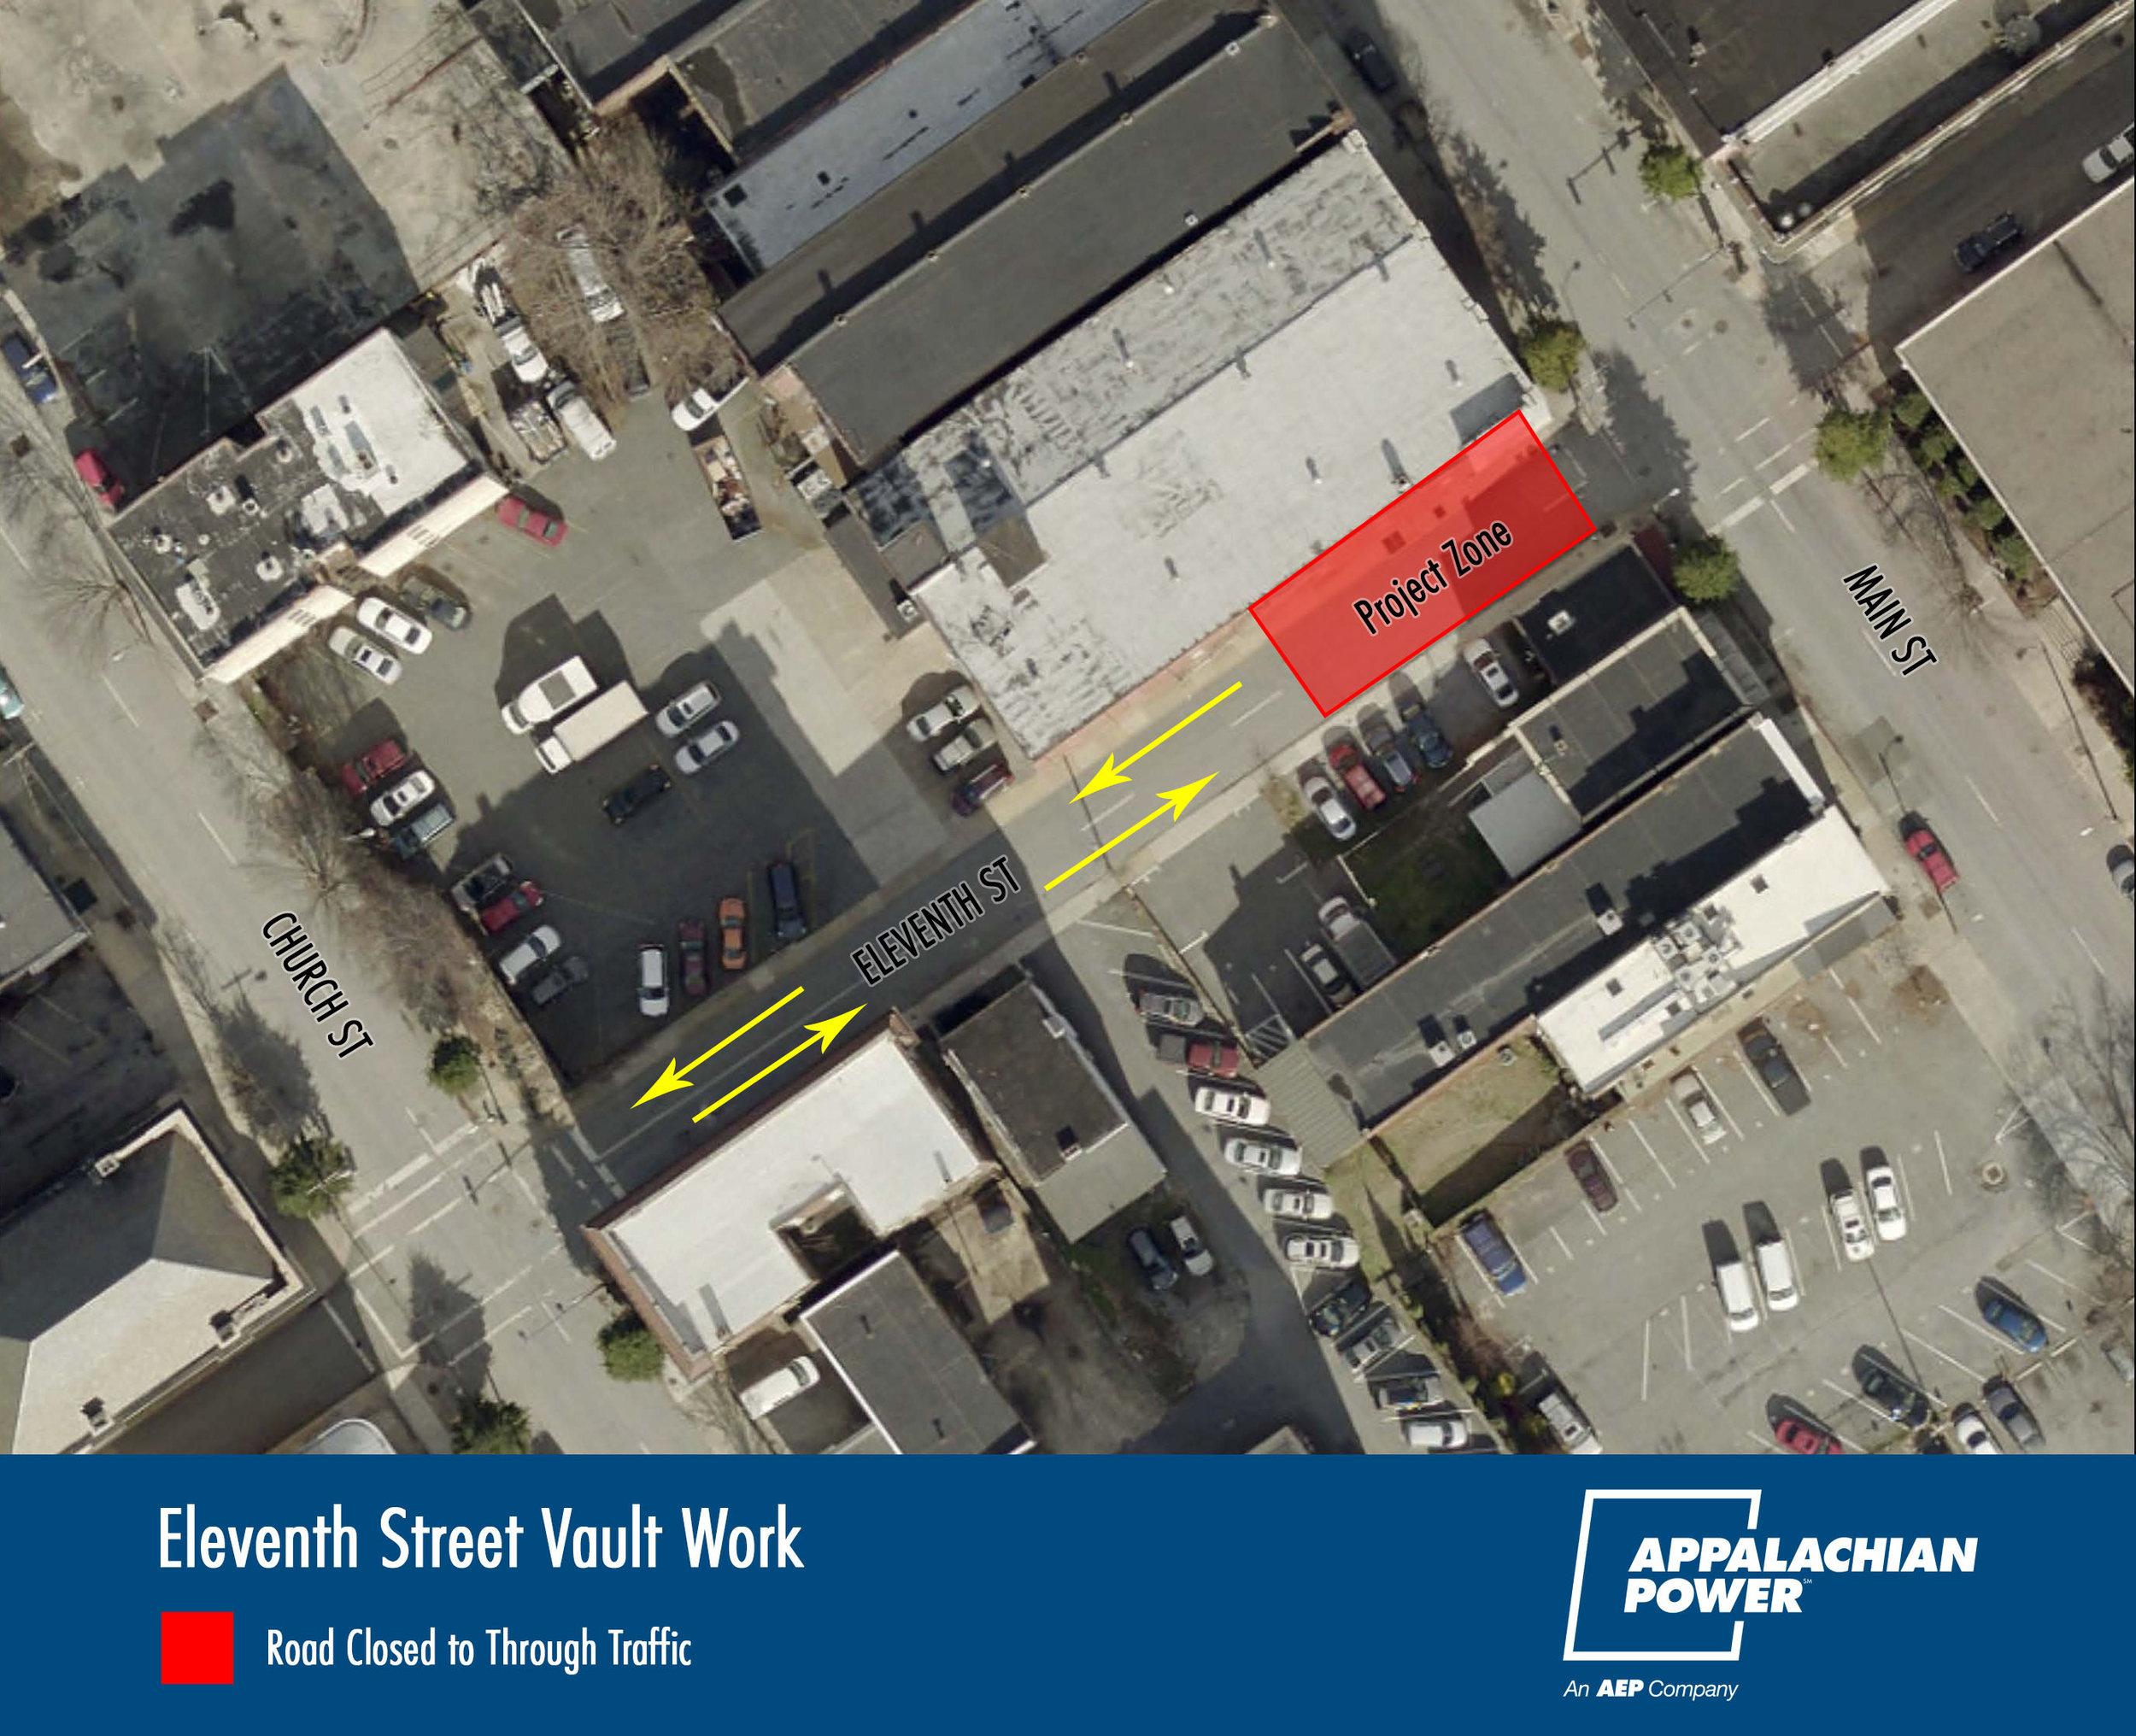 19 0417 Image - Appalachian Power Eleventh Street Vault.jpg